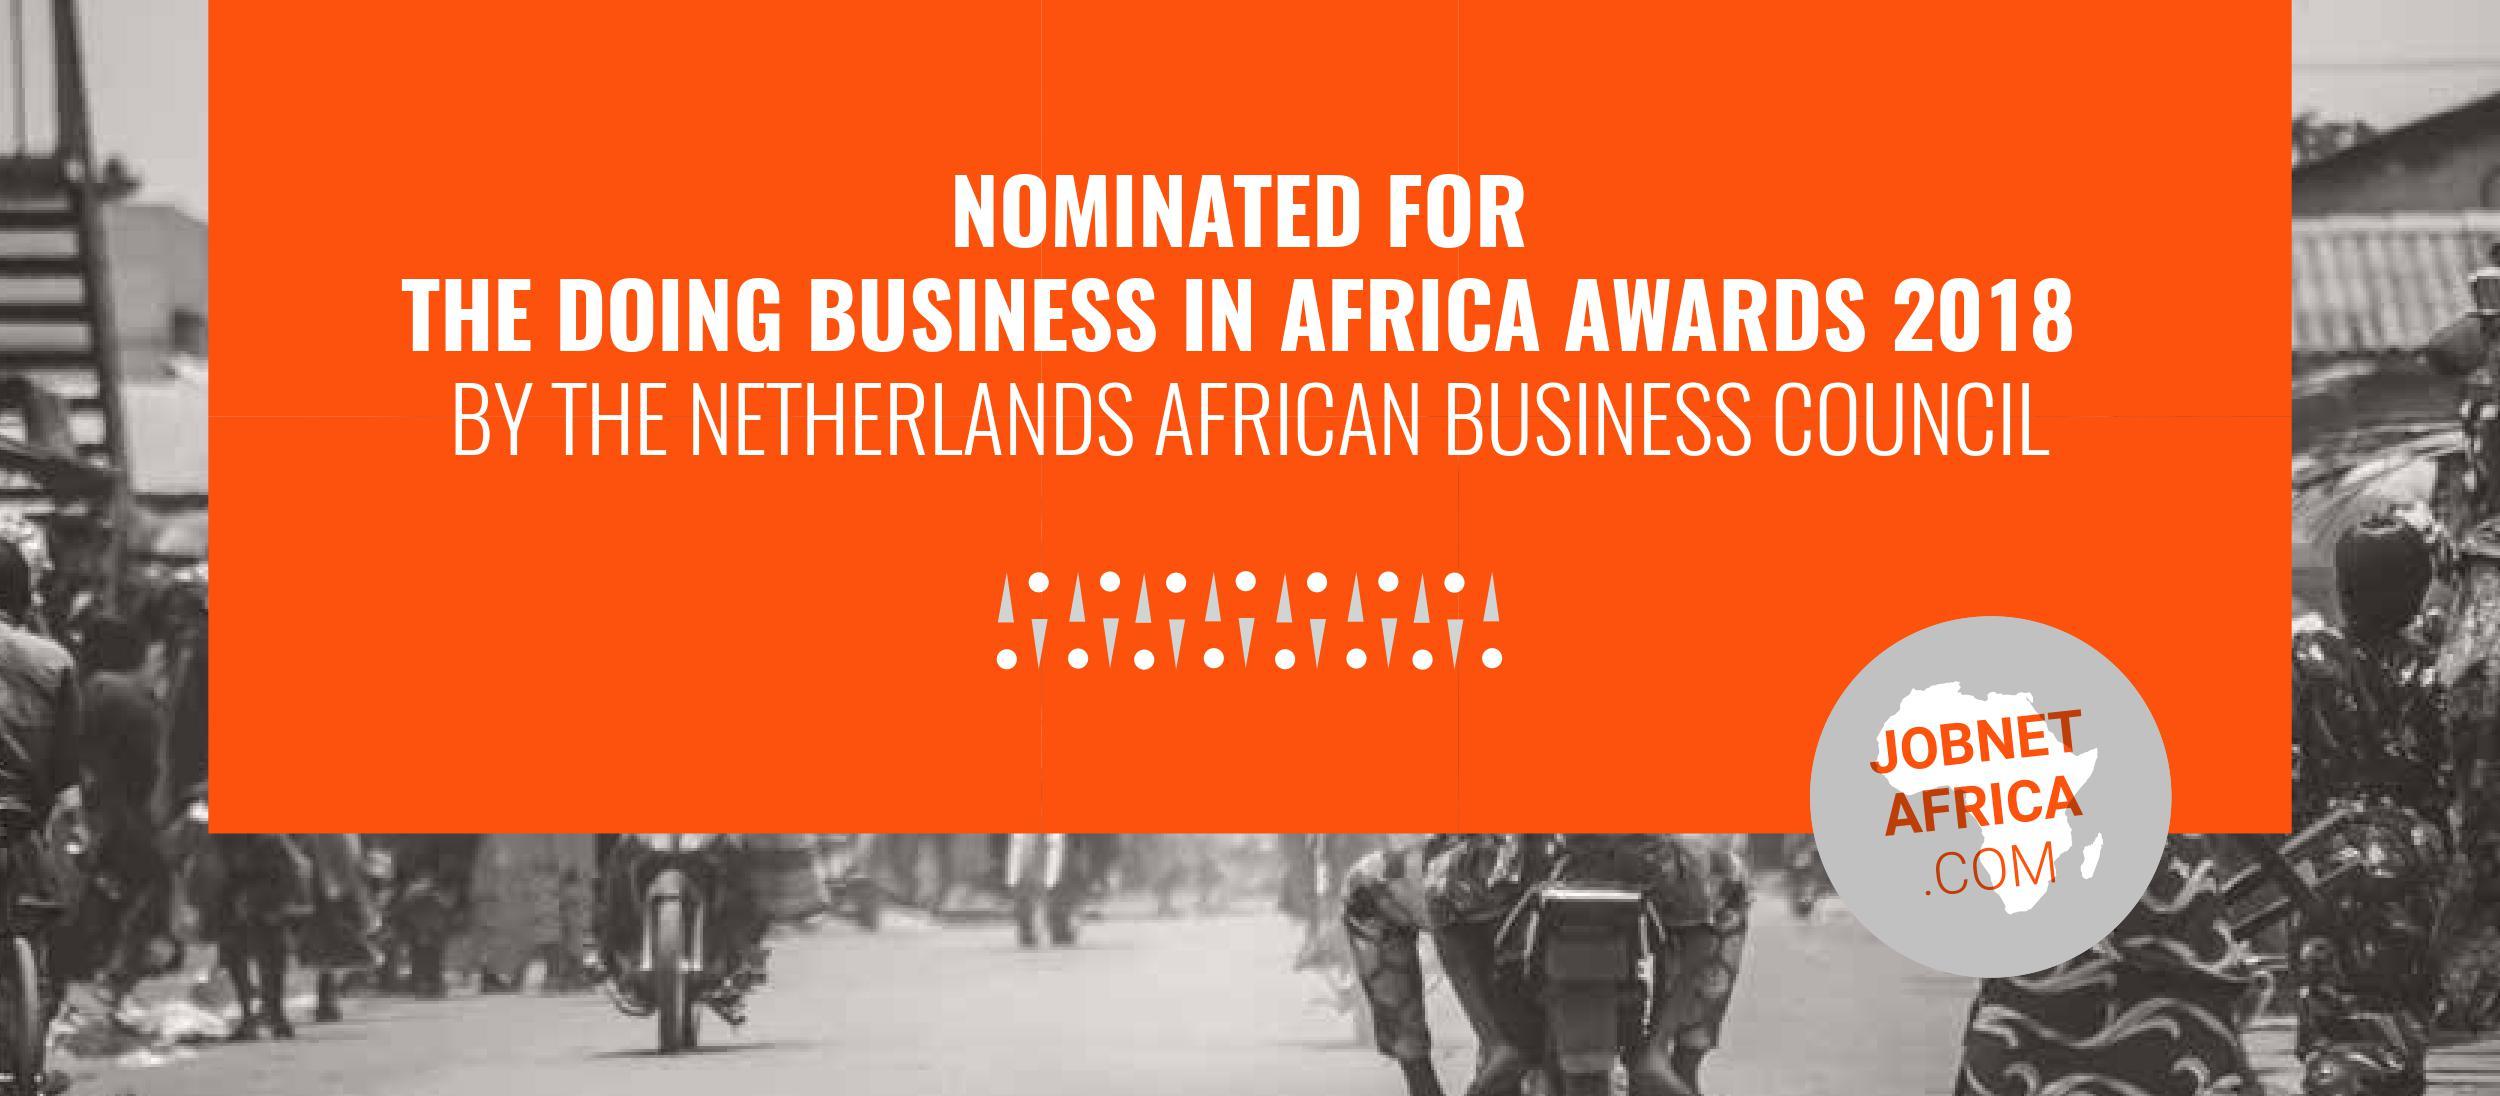 Find international jobs in Africa | JobnetAfrica